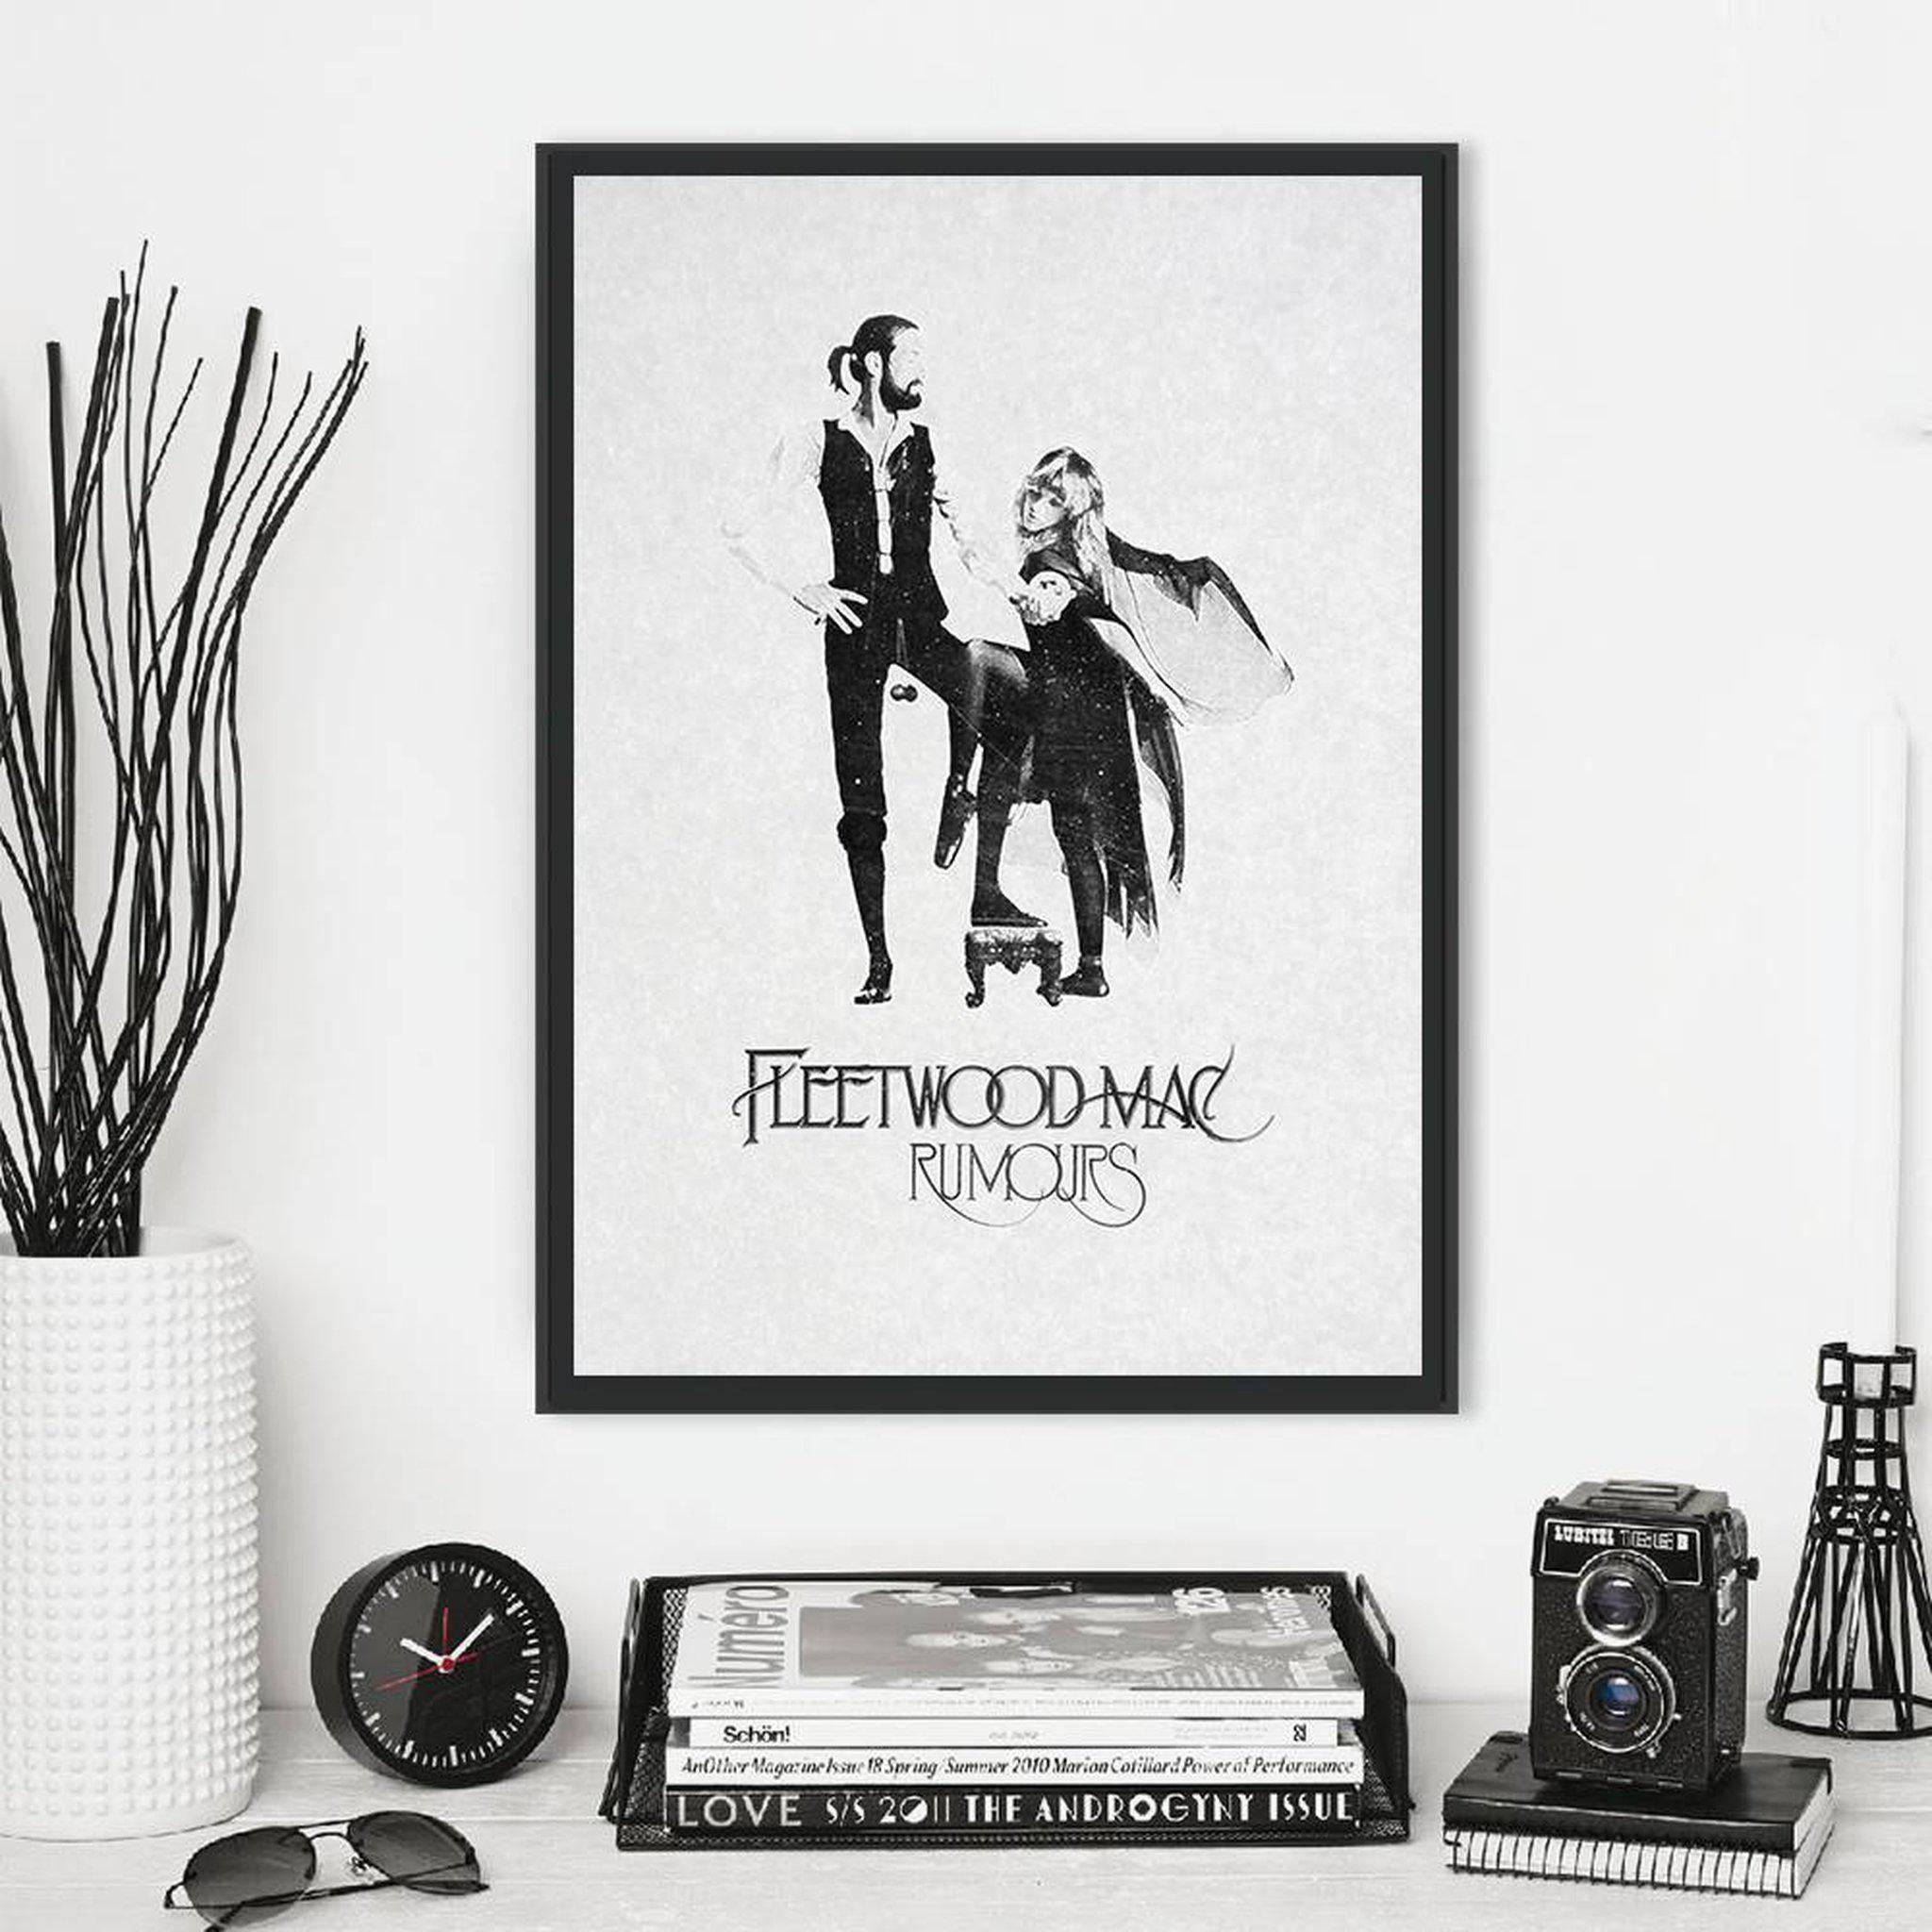 Fleetwood mac, vintage music poster в 2020 г.